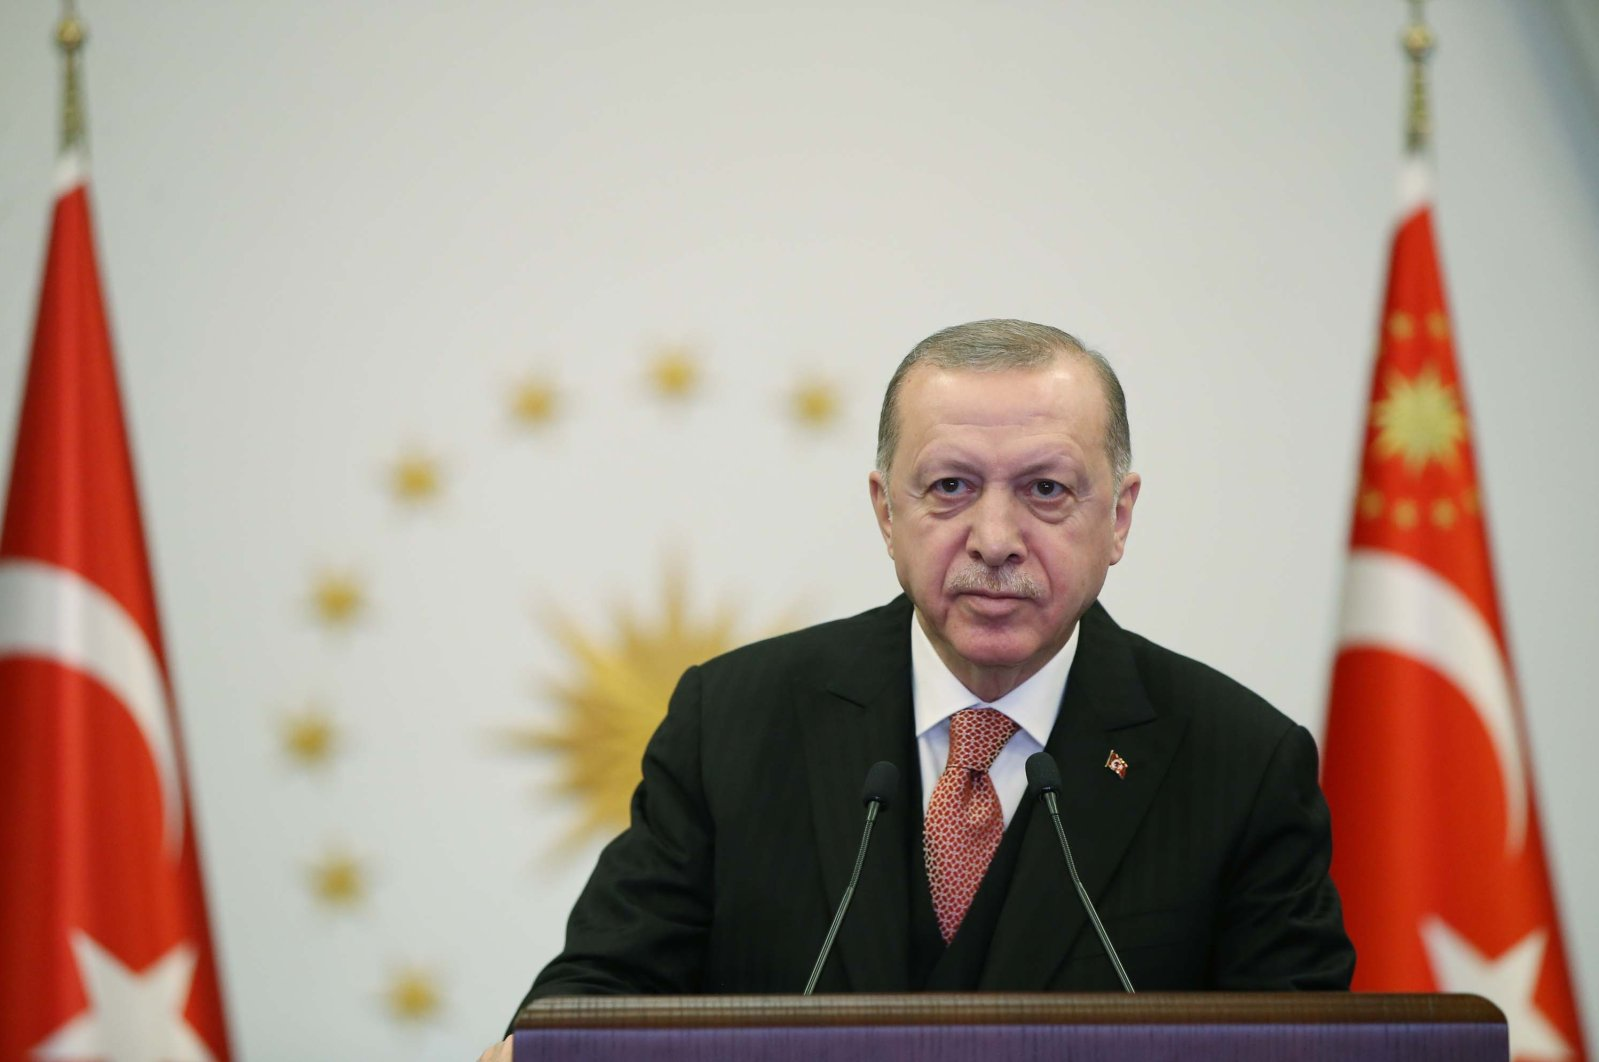 President Recep Tayyip Erdoğan speaks at an event in the capital Ankara, Turkey, April 21, 2021. (DHA Photo)